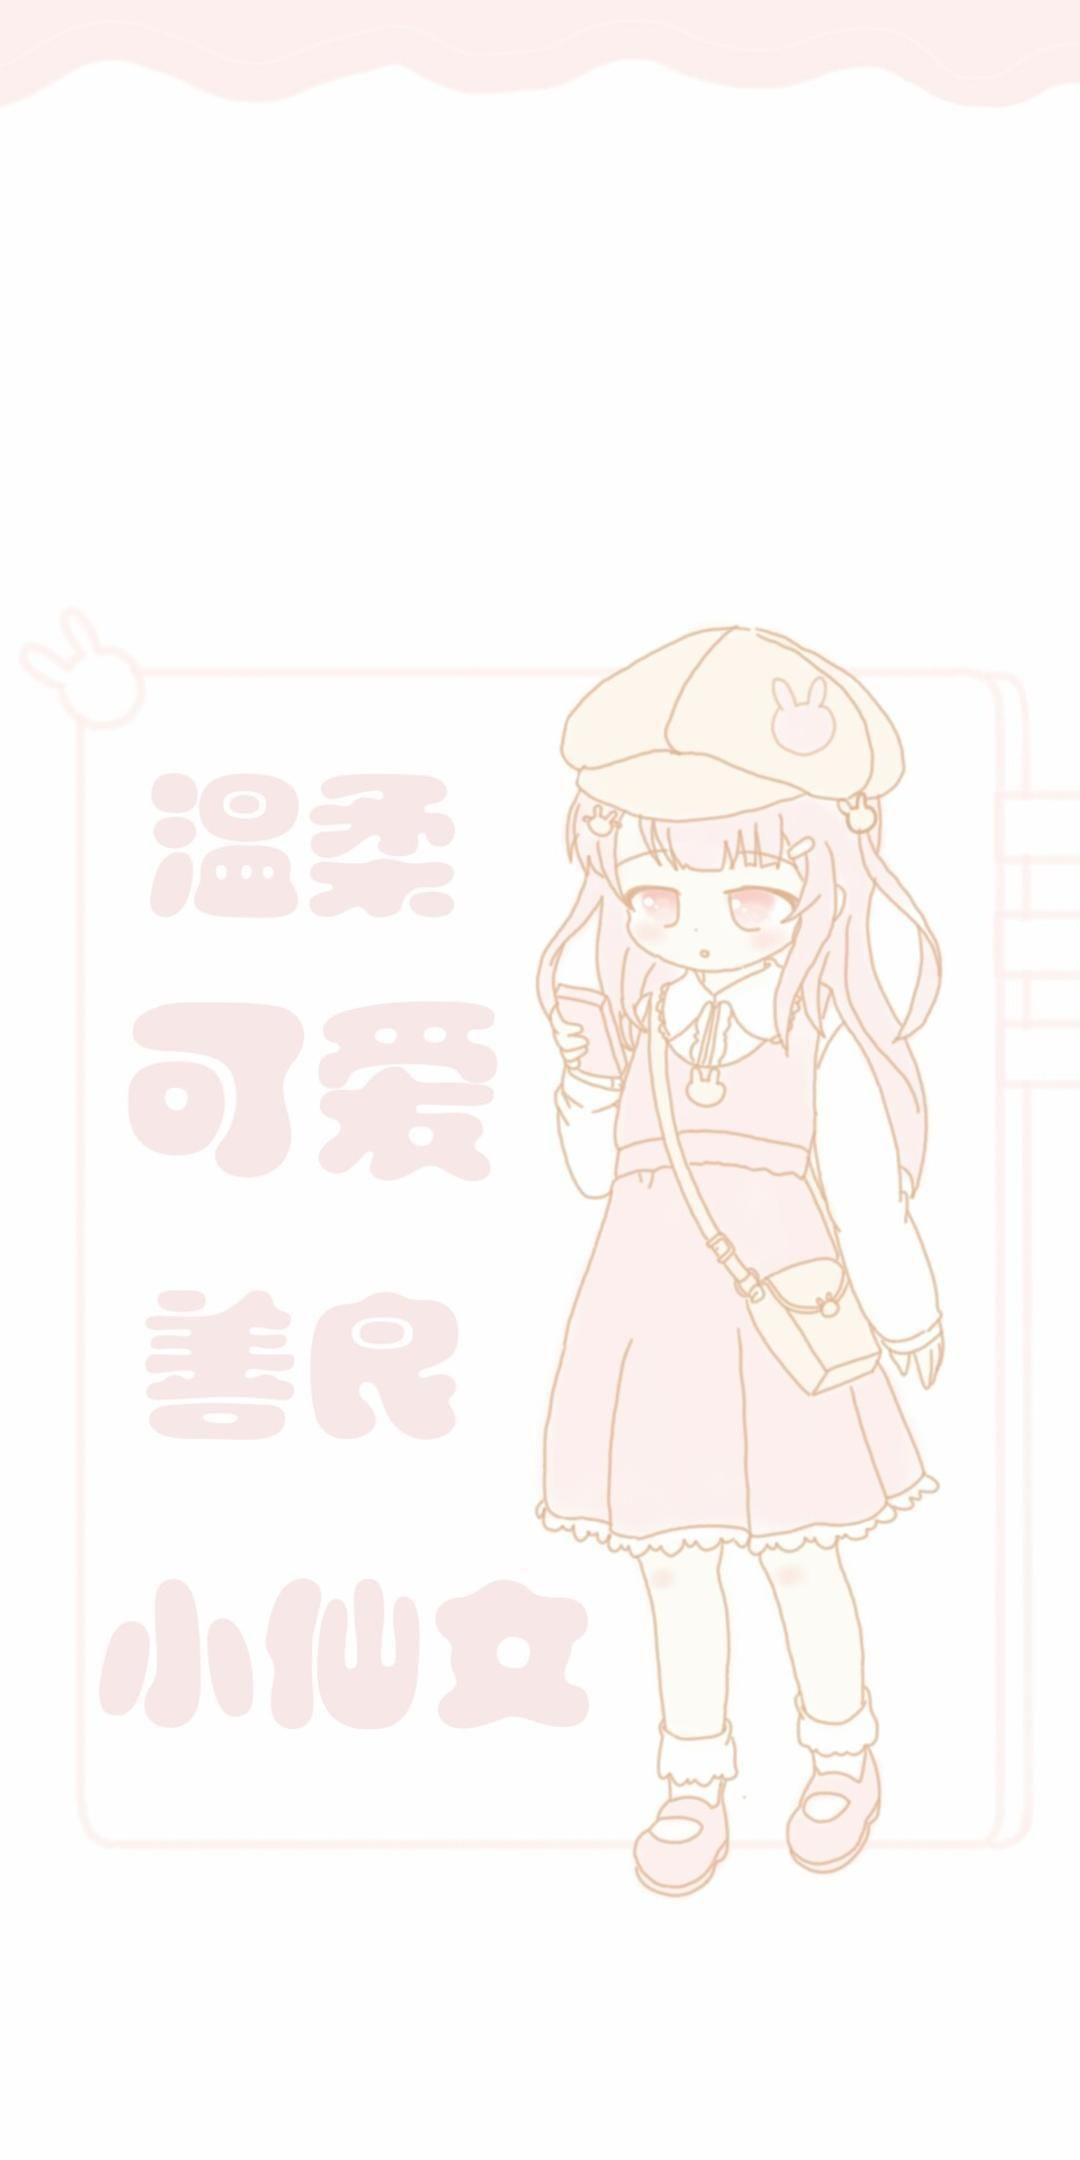 5e67b89930c5d - 粉色系少女心手机壁纸